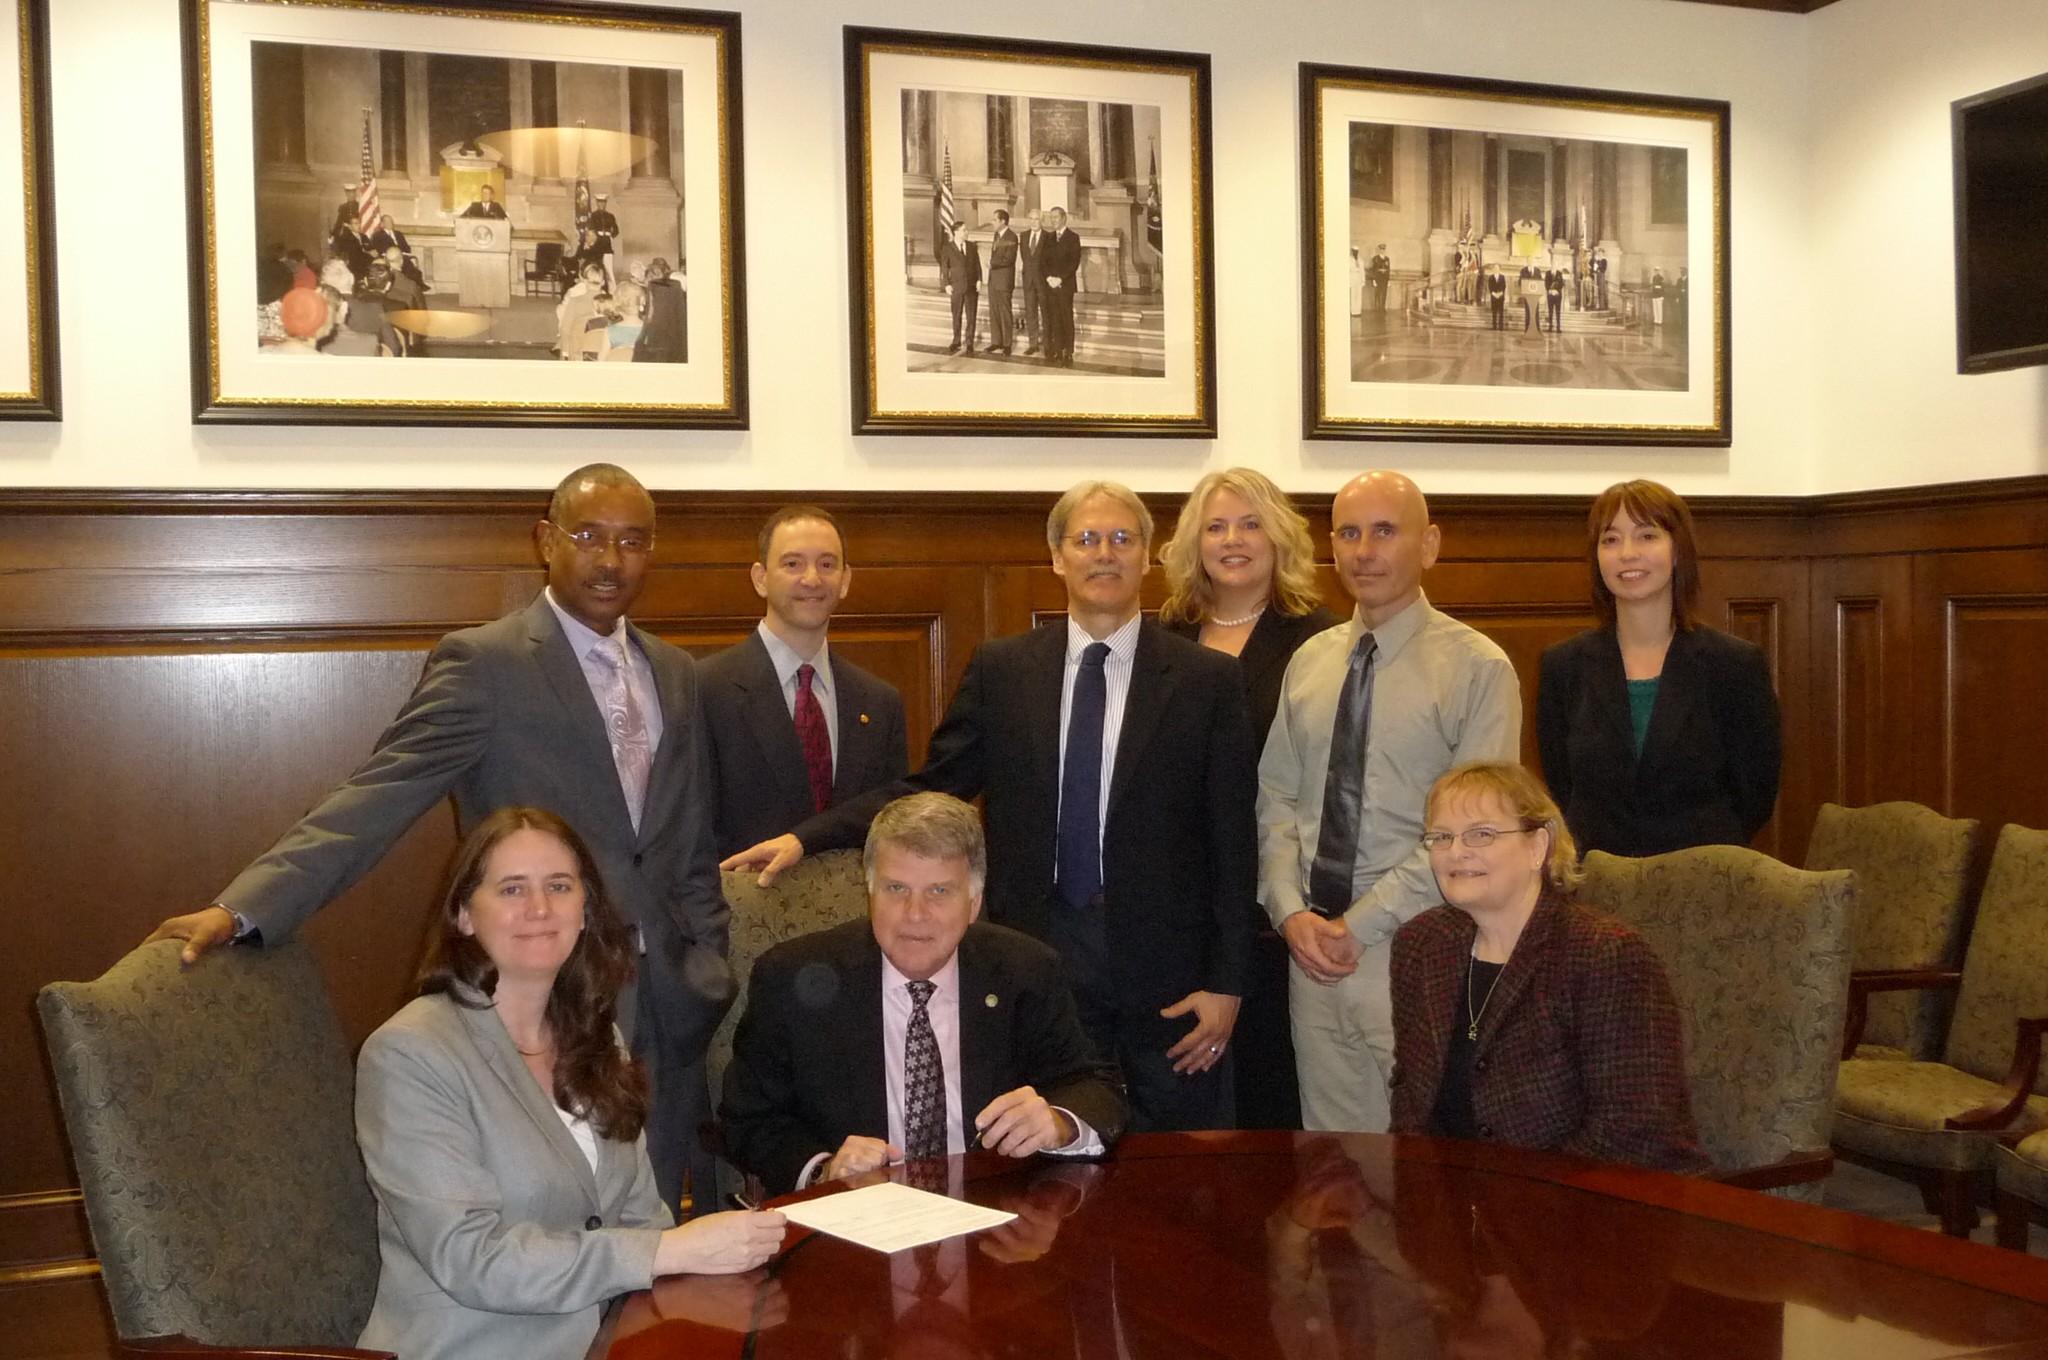 Photo of USPTO staff and NARA staff, November 16, 2011